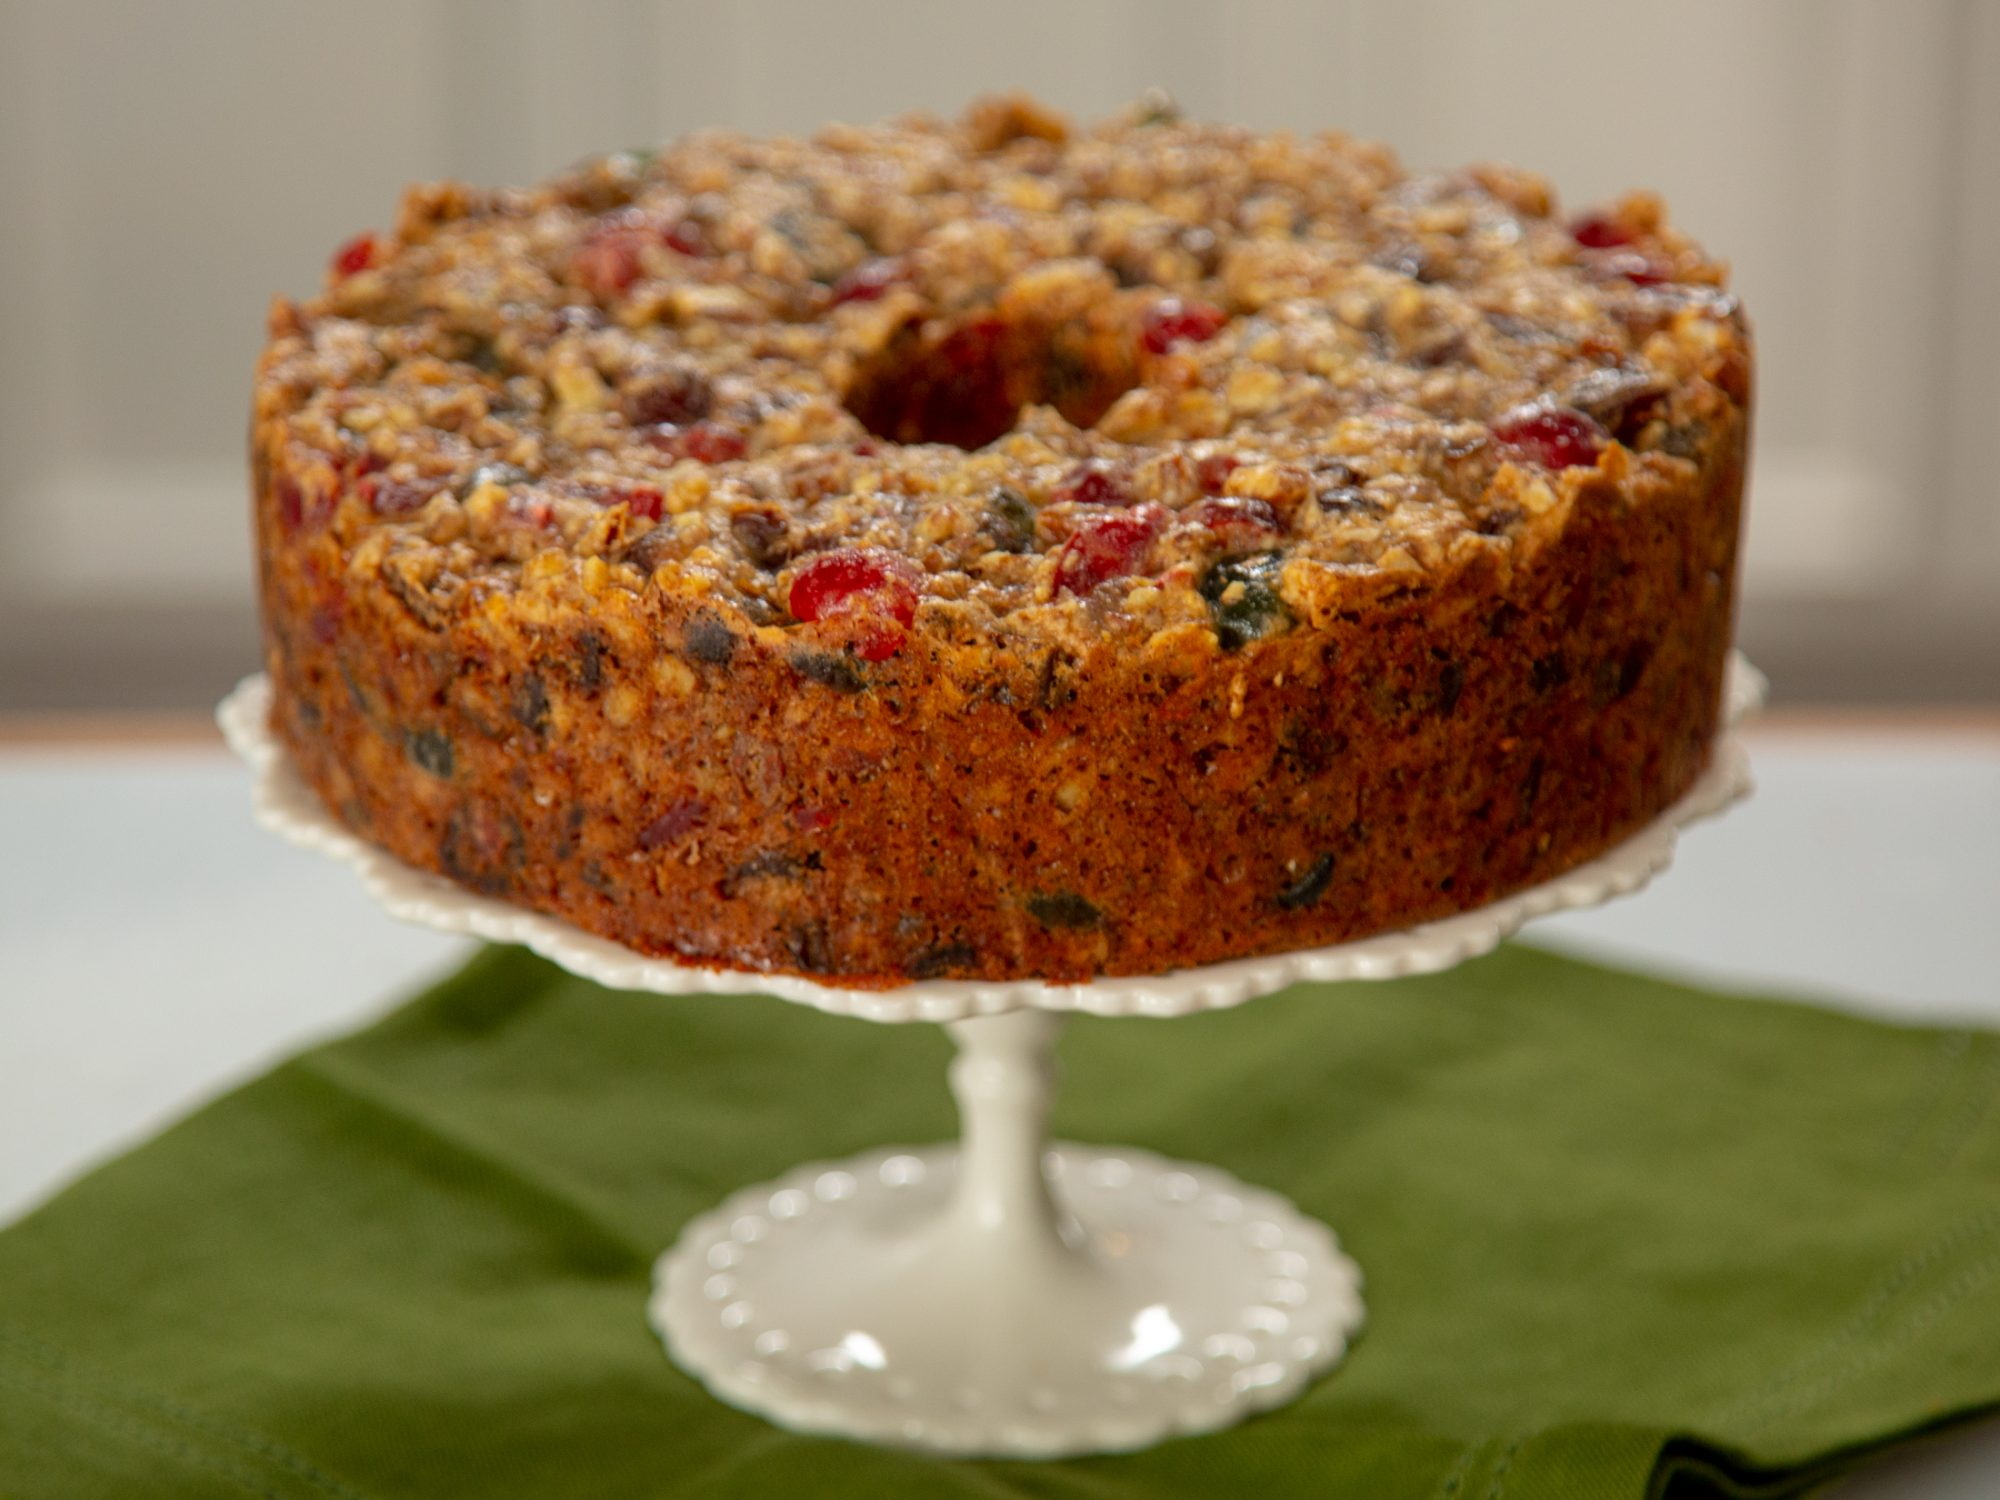 Grandma's Truly Delicious Fruitcake image